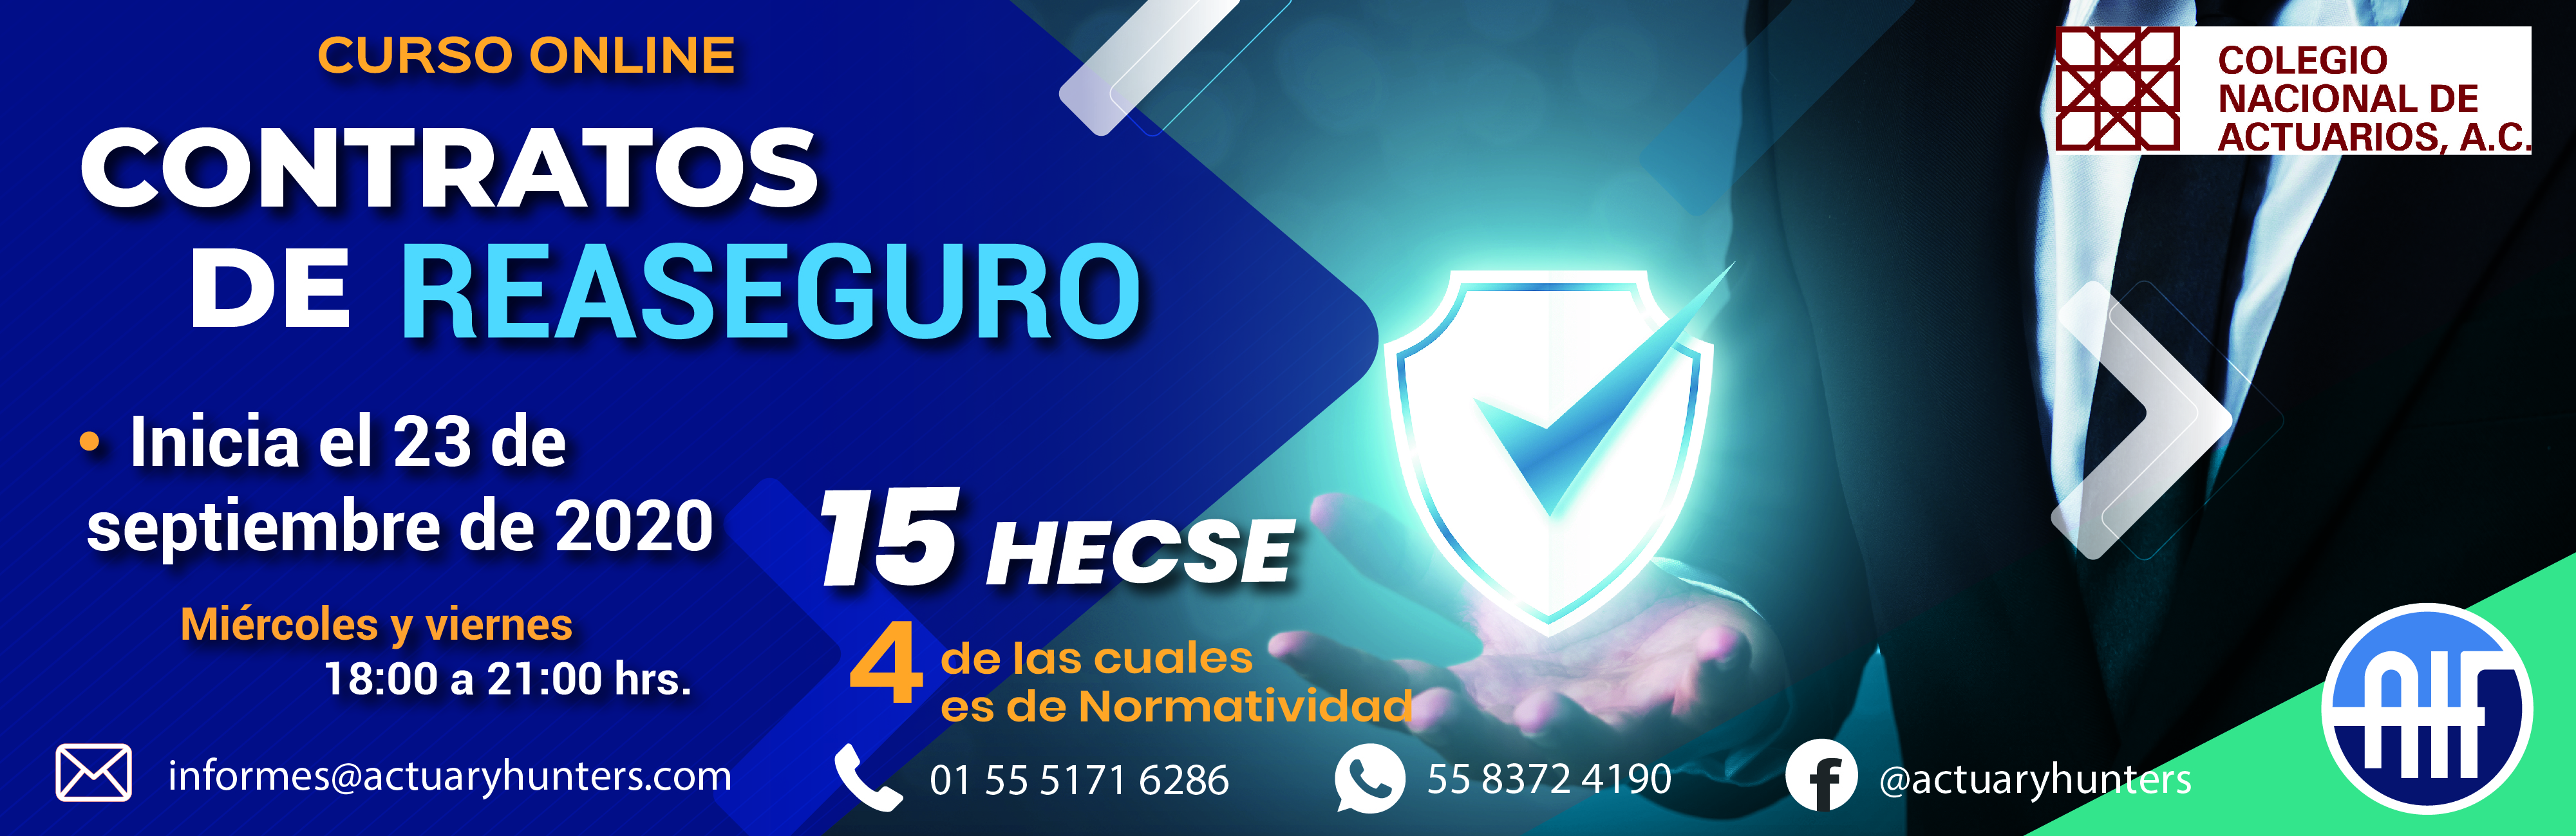 BANNER_CONAC_CONTRATOS_DE_REASEGURO_SEP_2020_WEB